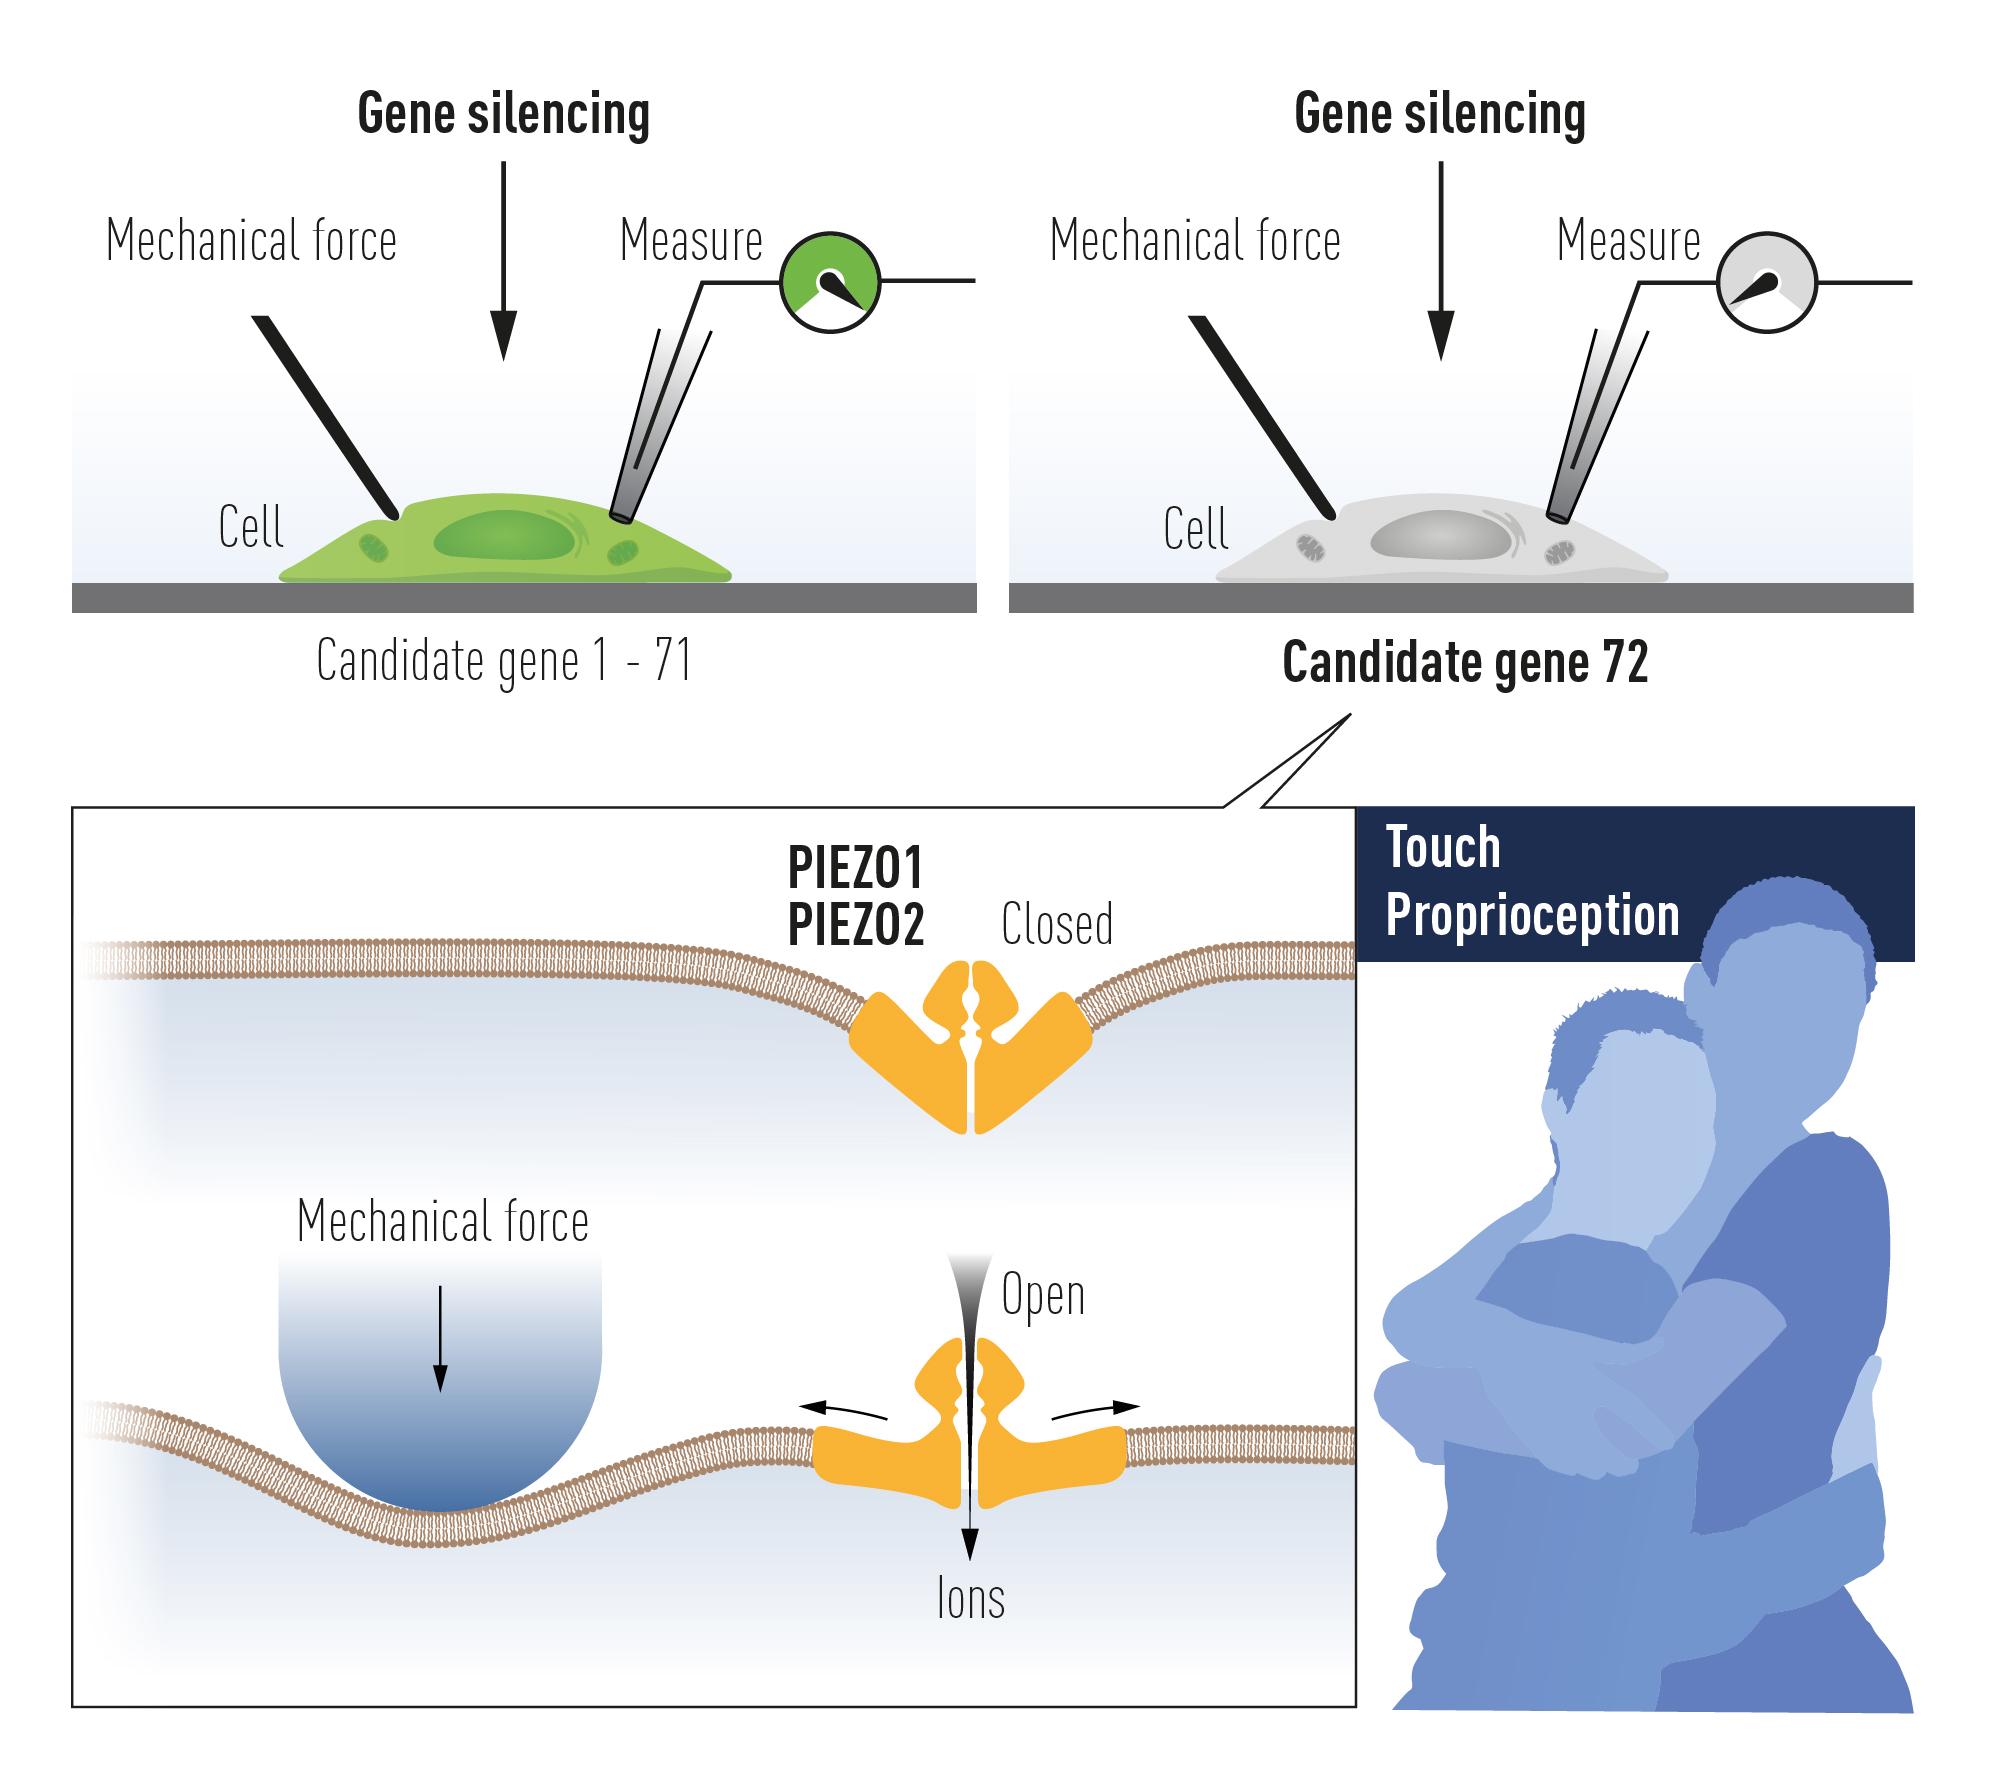 Mechanosensitive cells